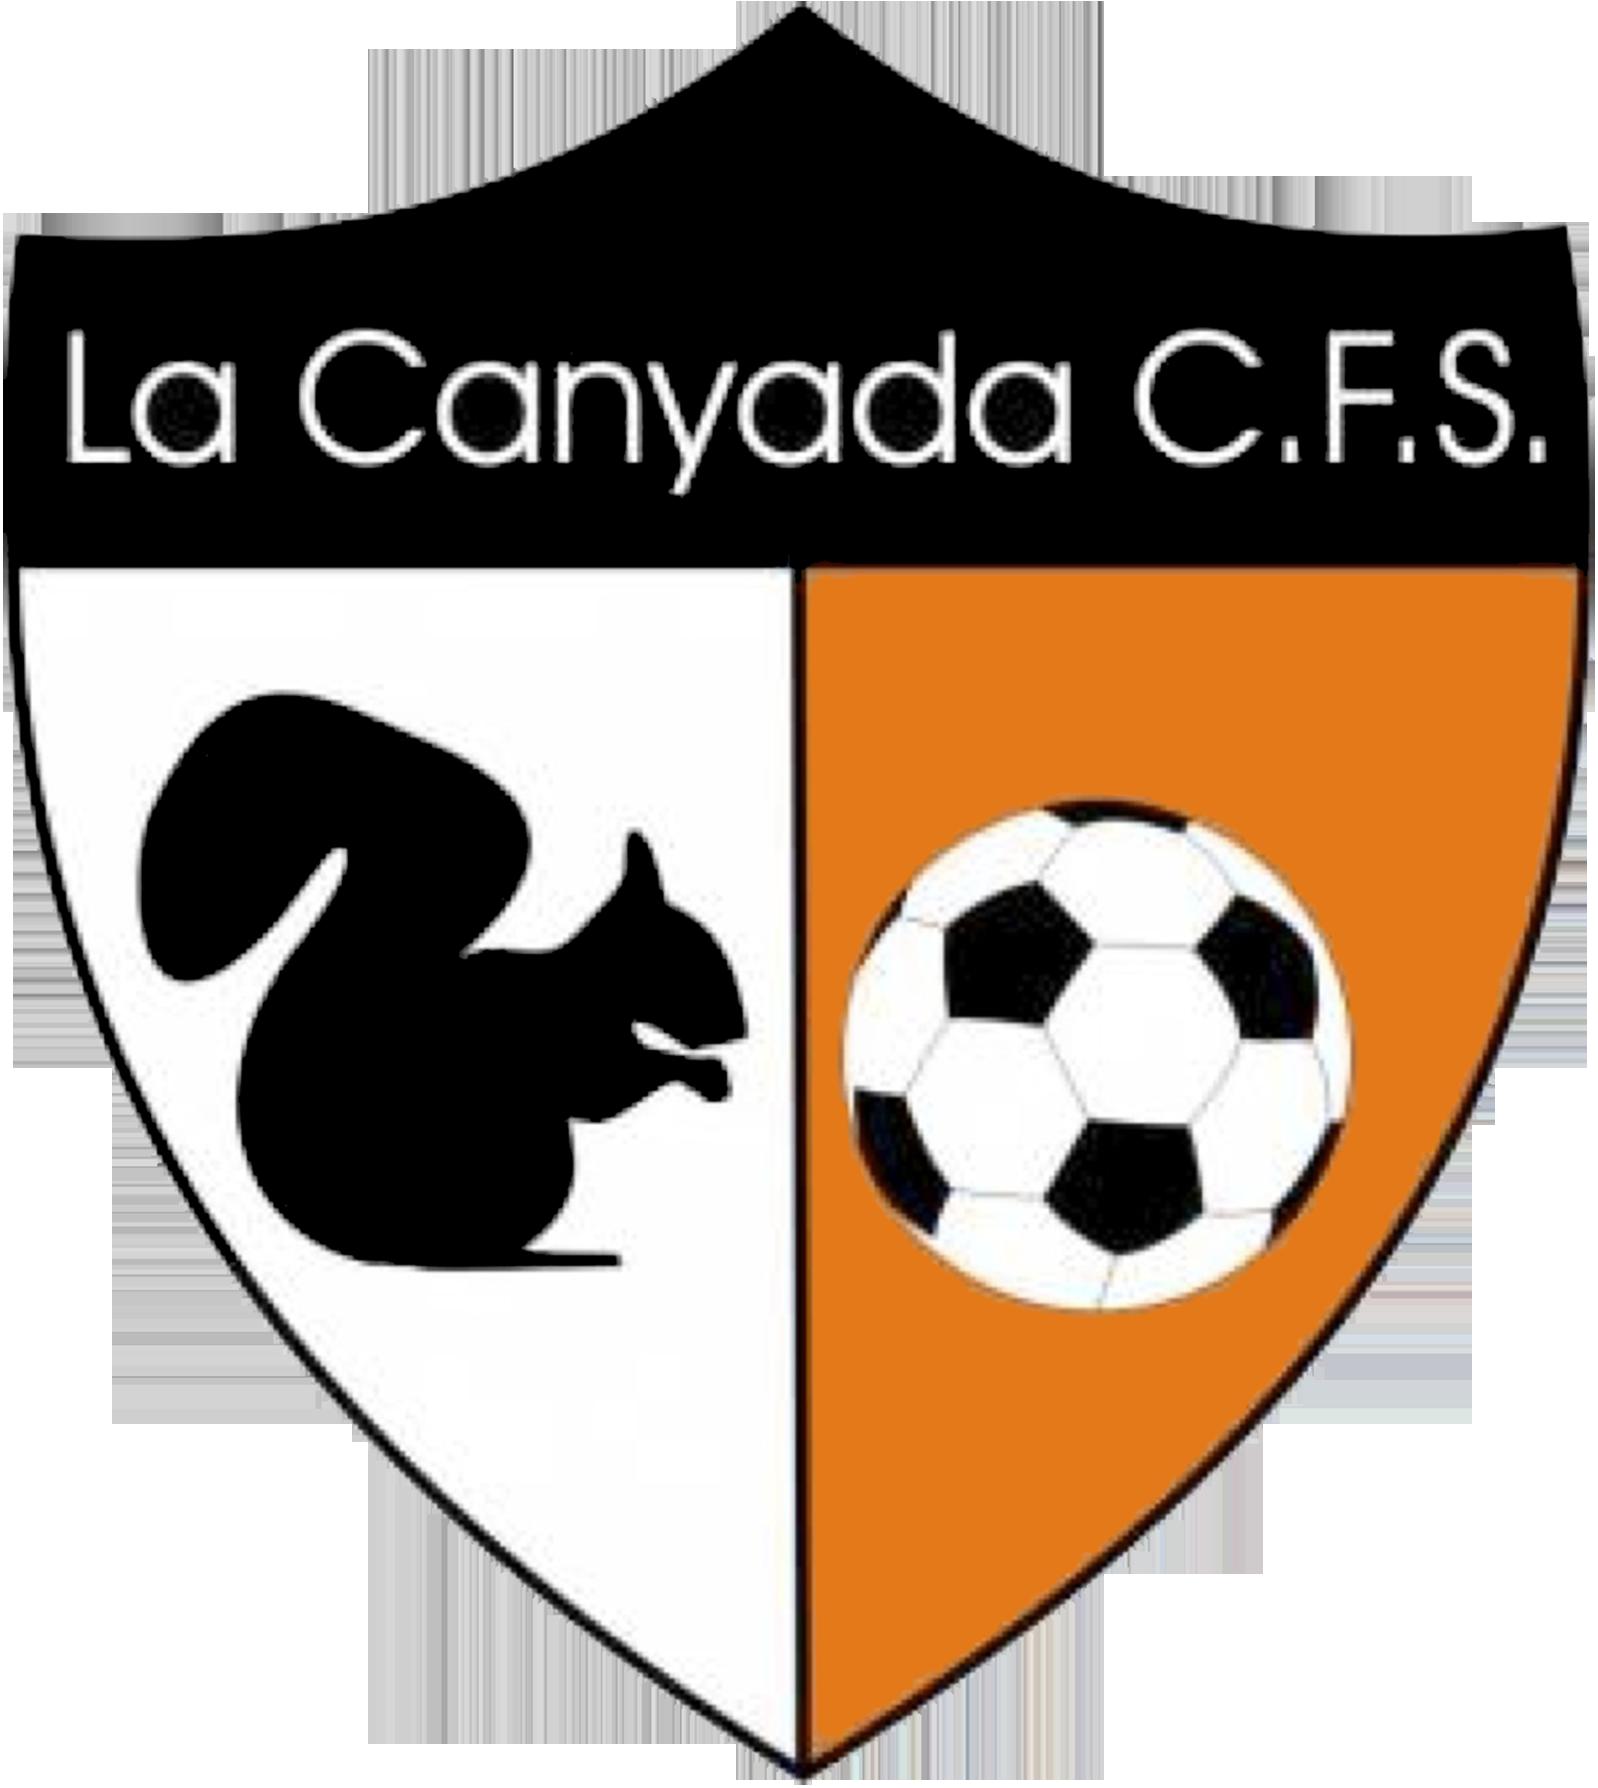 LA CANYADA CFS.